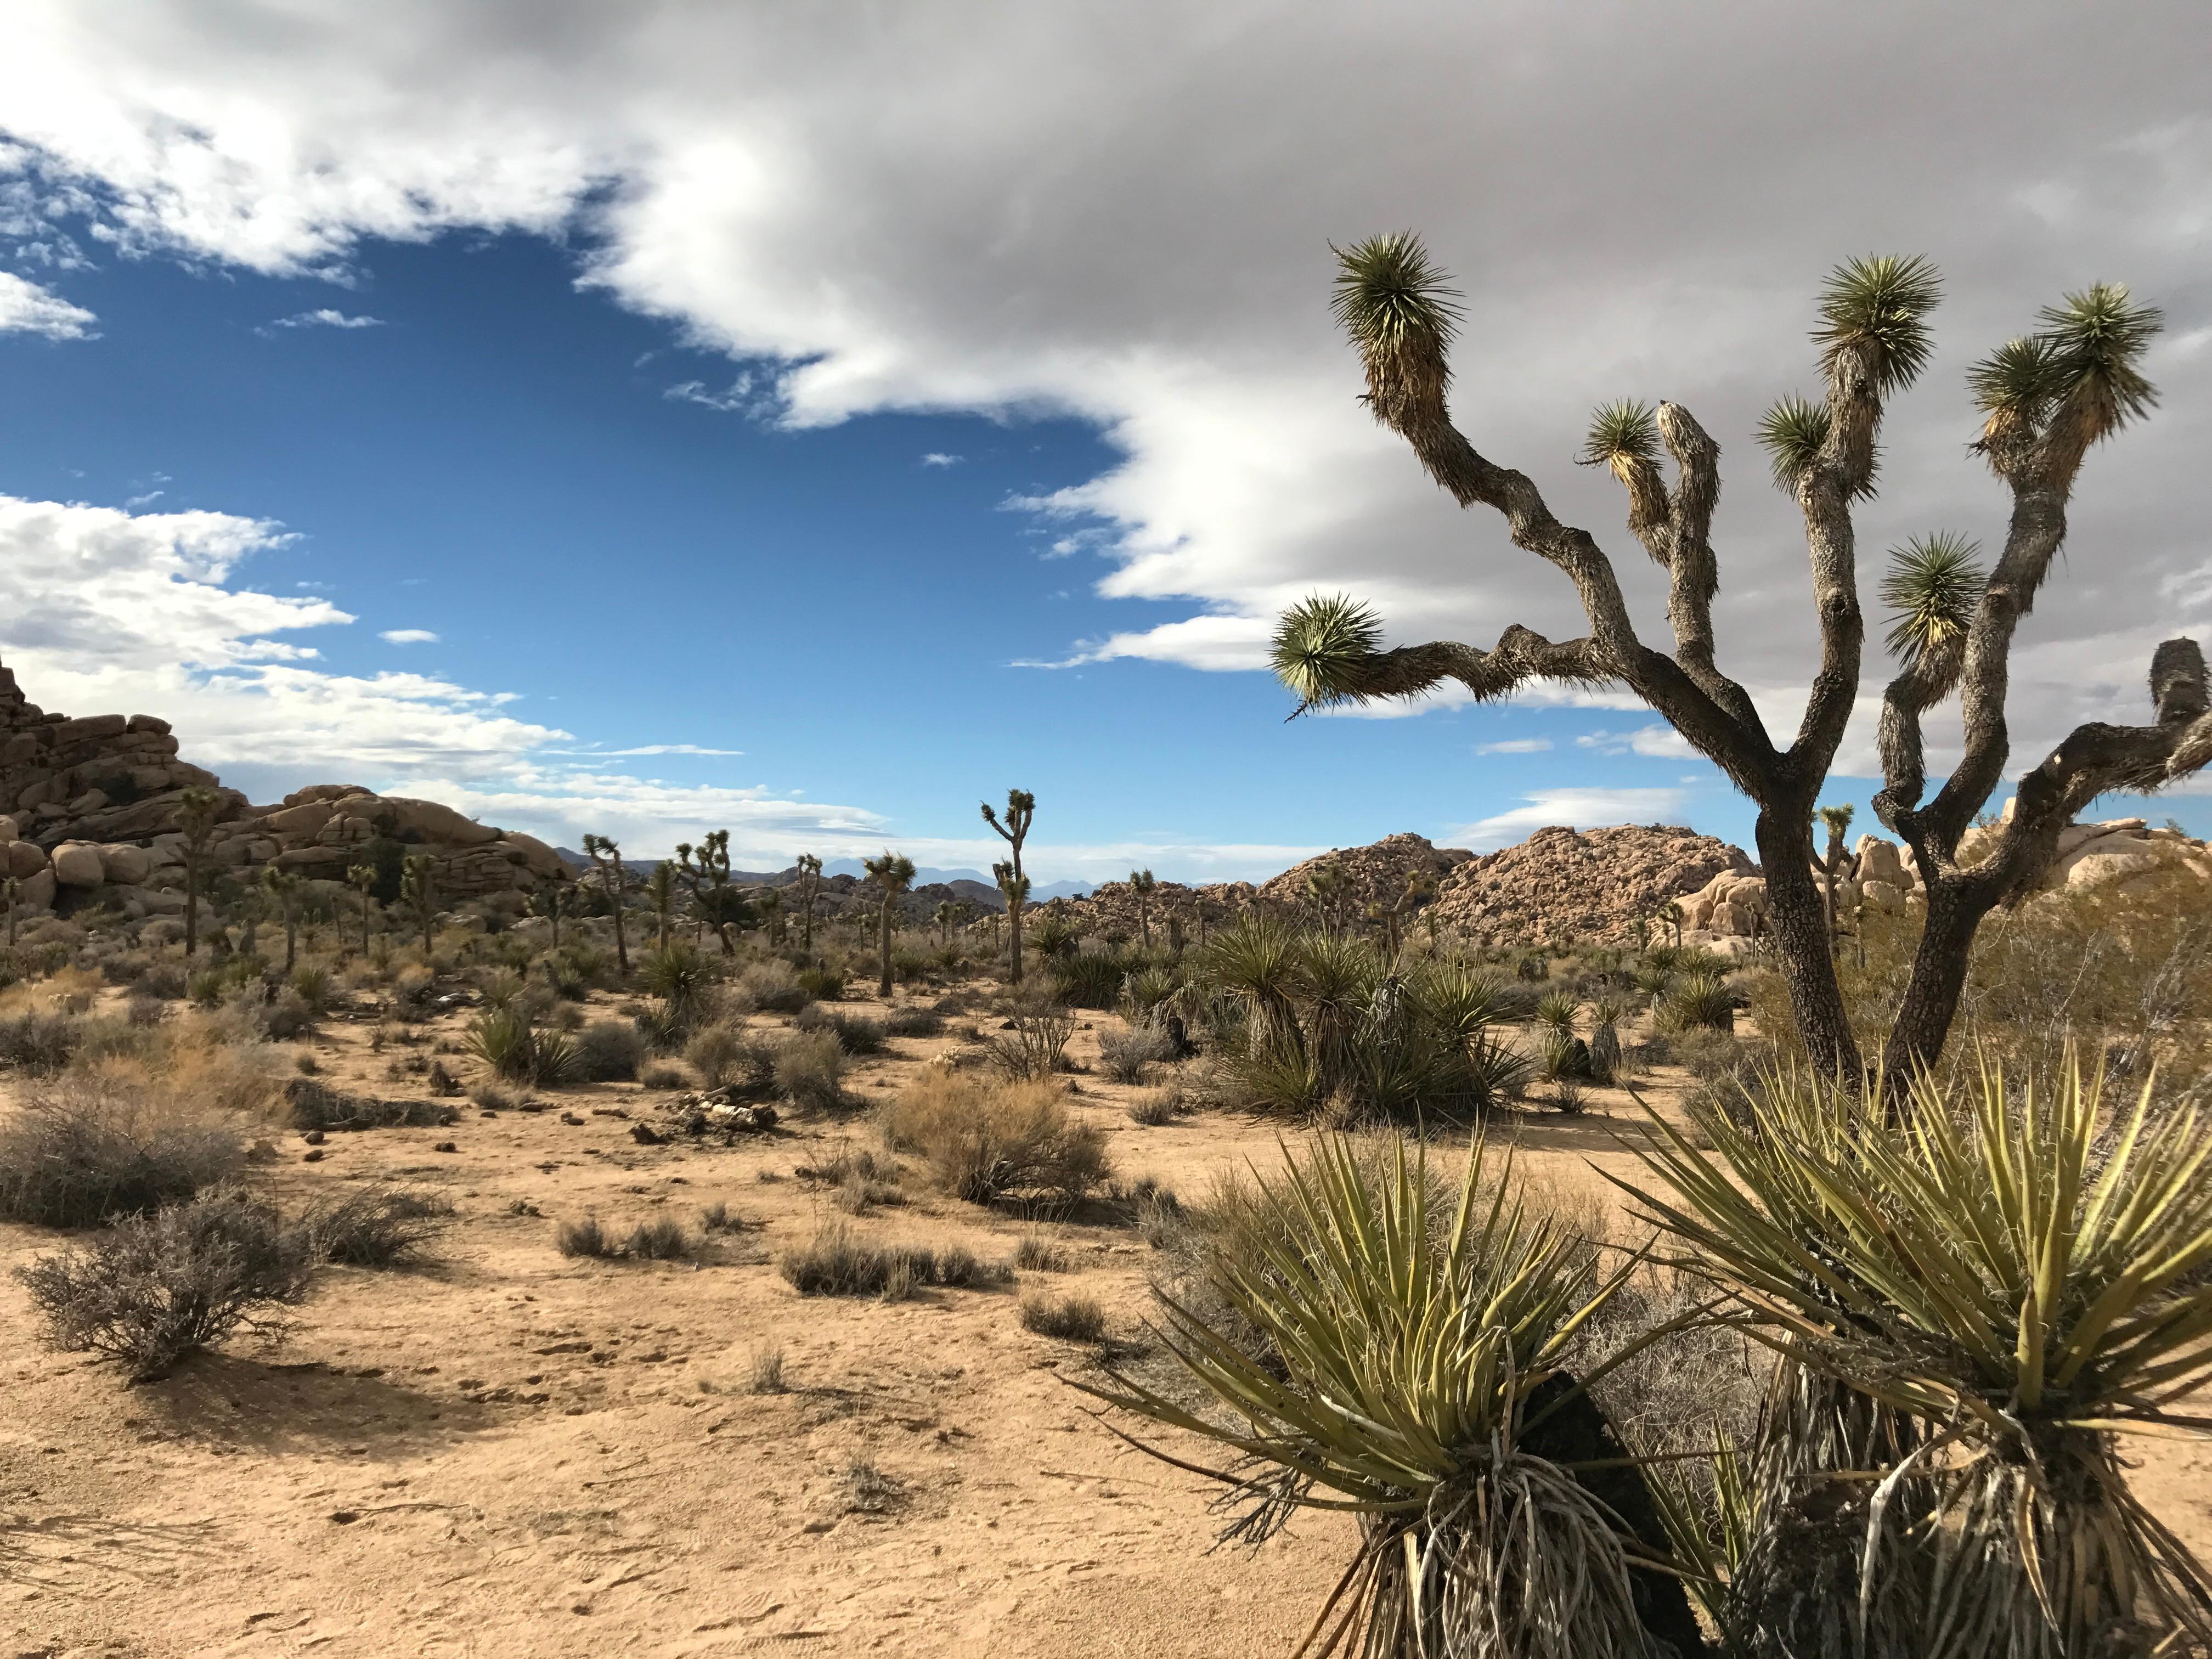 sahara desert plants - HD1200×900